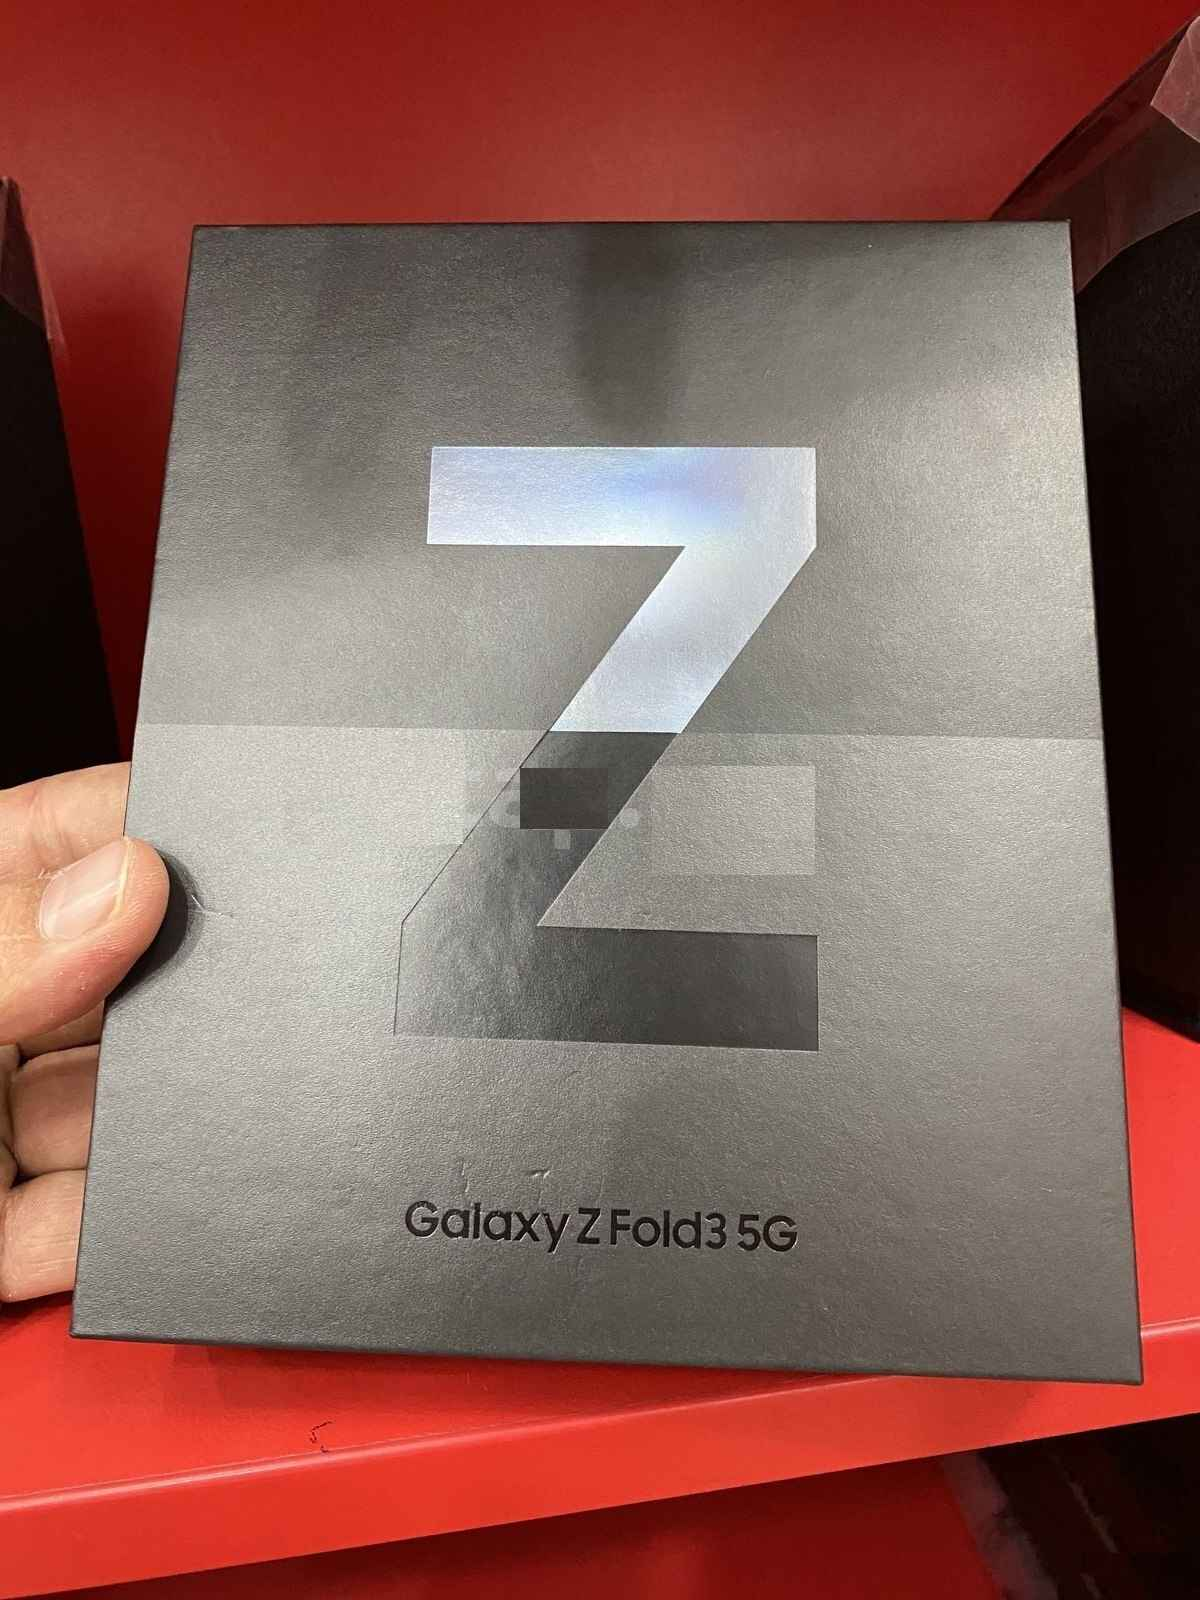 Samsung Z Flip3 5G, Samsung Z Fold3 5G, iPhone 13 Pro Max, iPhone 13 Stare Miasto - zdjęcie 1